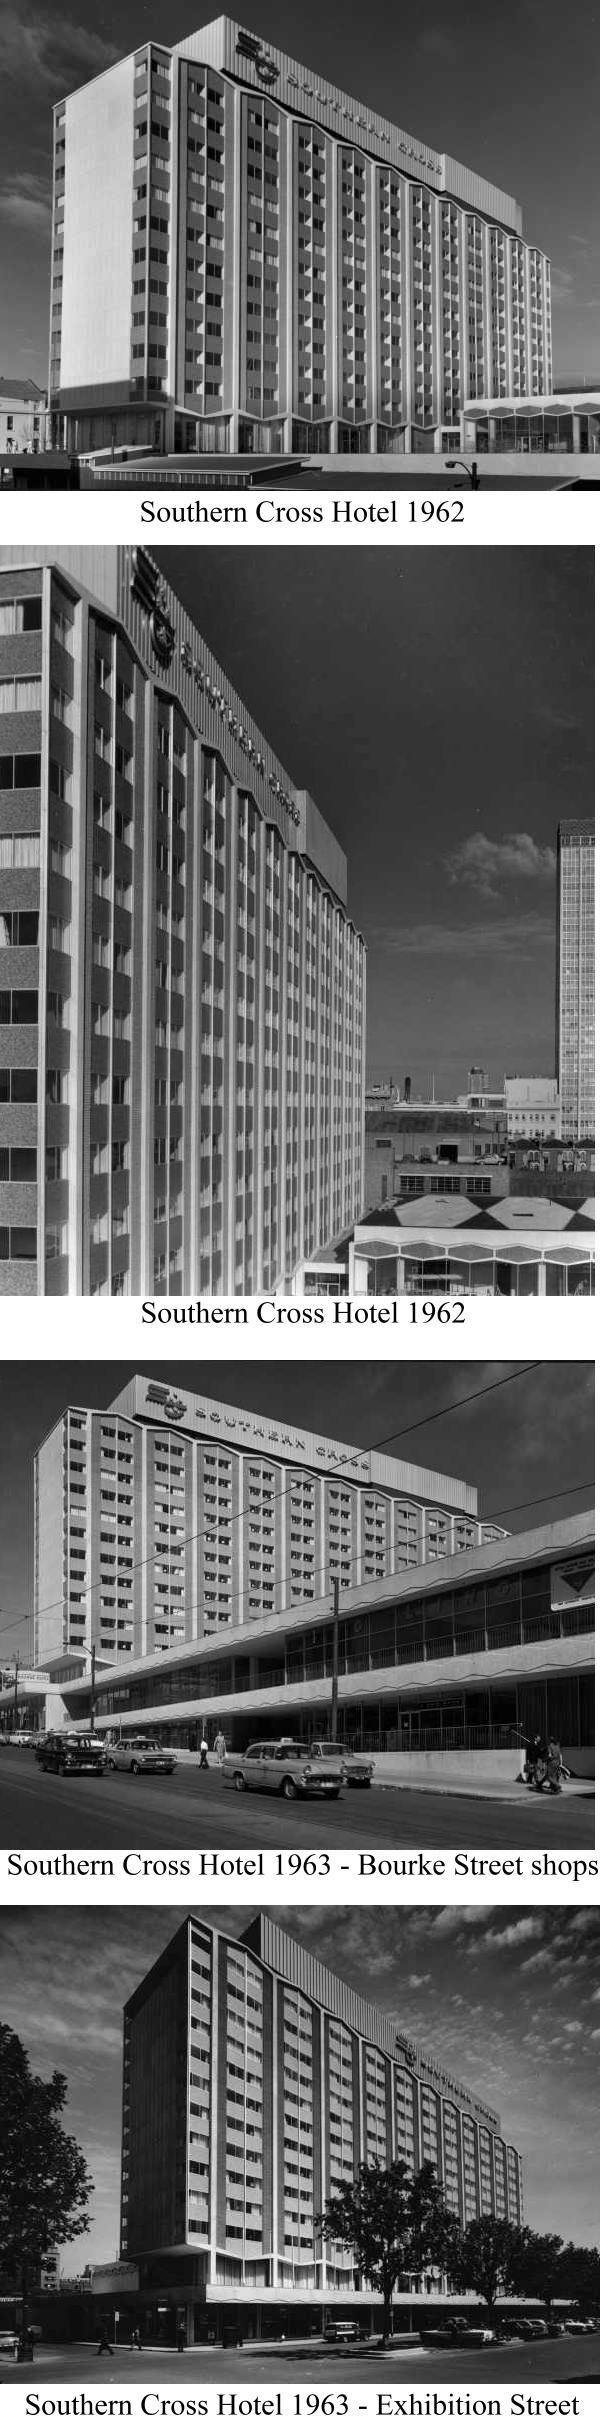 Southern Cross Hotel Melbourne Australia